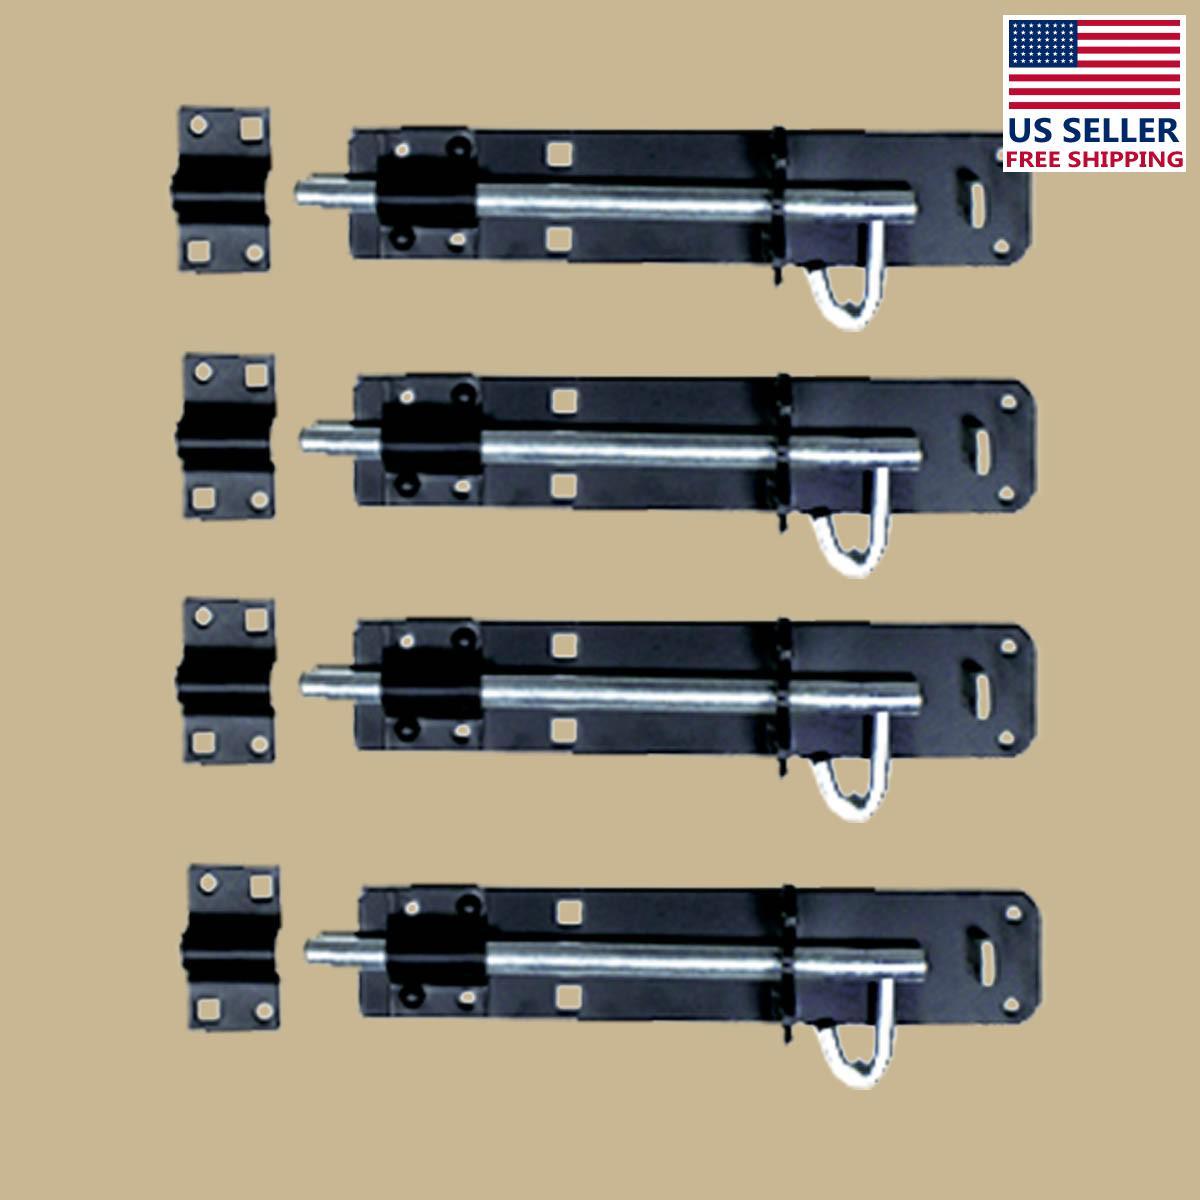 4 Black Wrought Iron Slide Door Brenton Bolt 8 | Renovators Supply 2